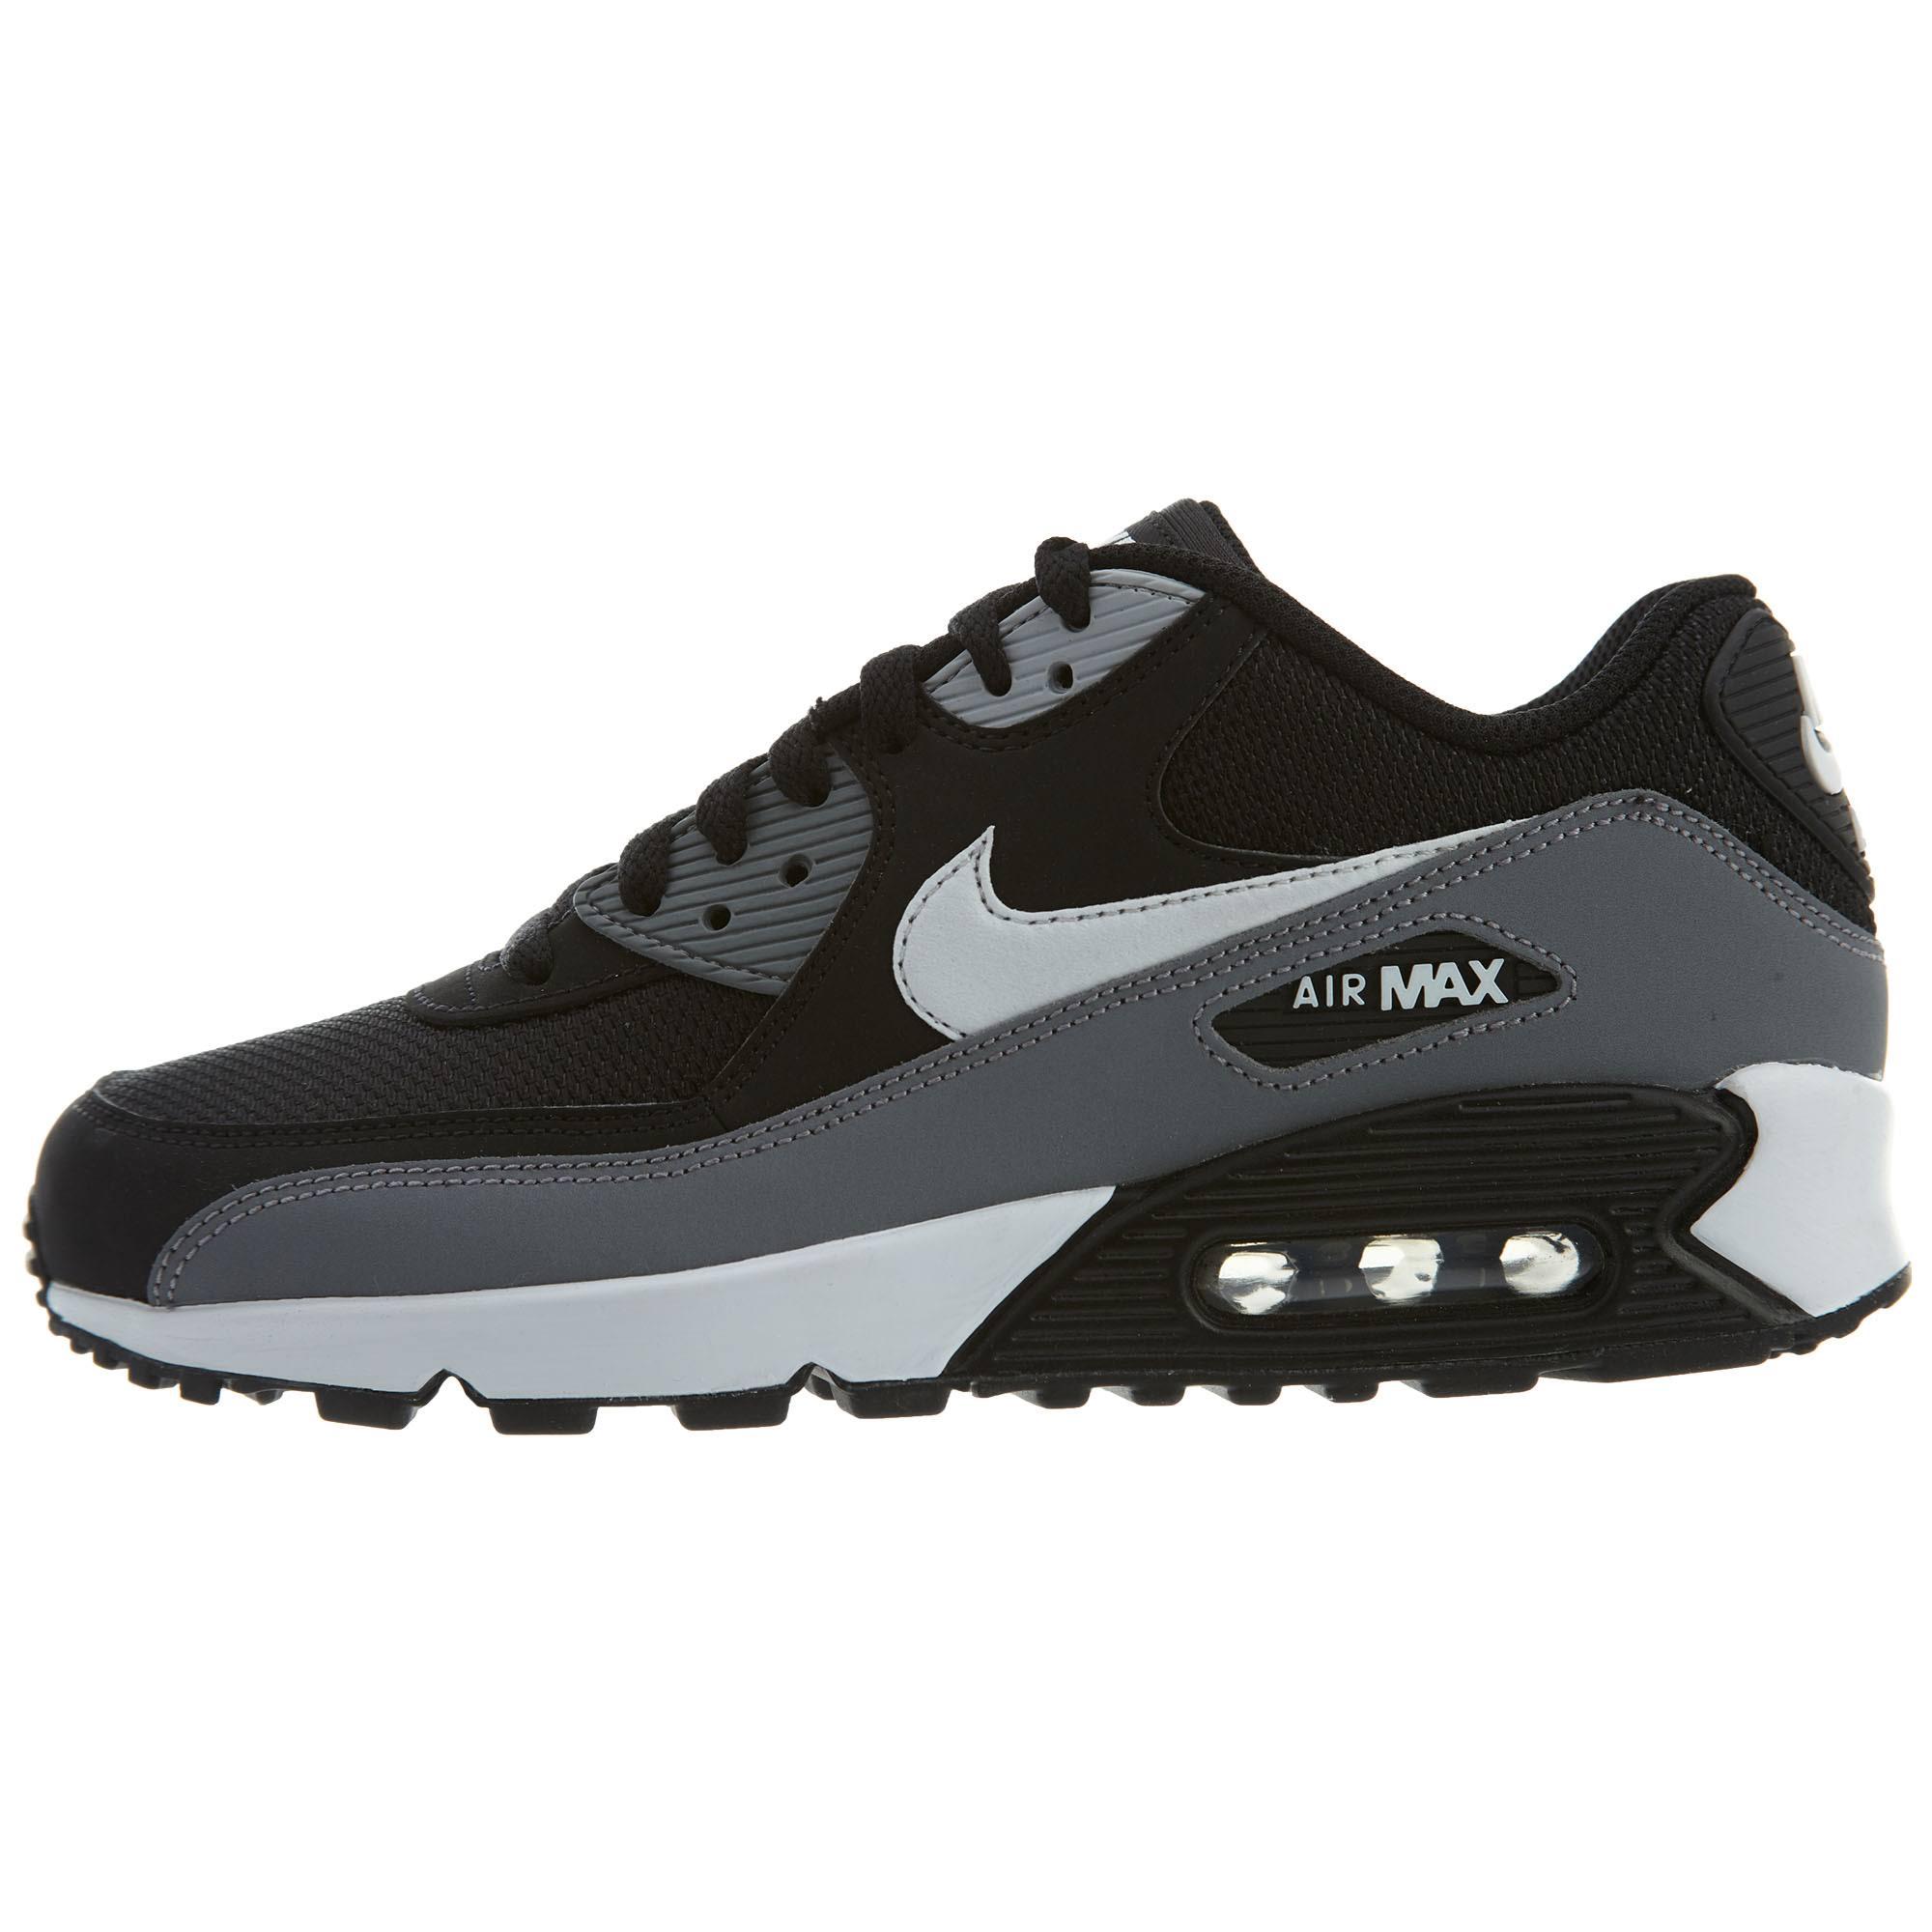 7 5 Essential Black Air Max 90 Nike g7ybf6Y